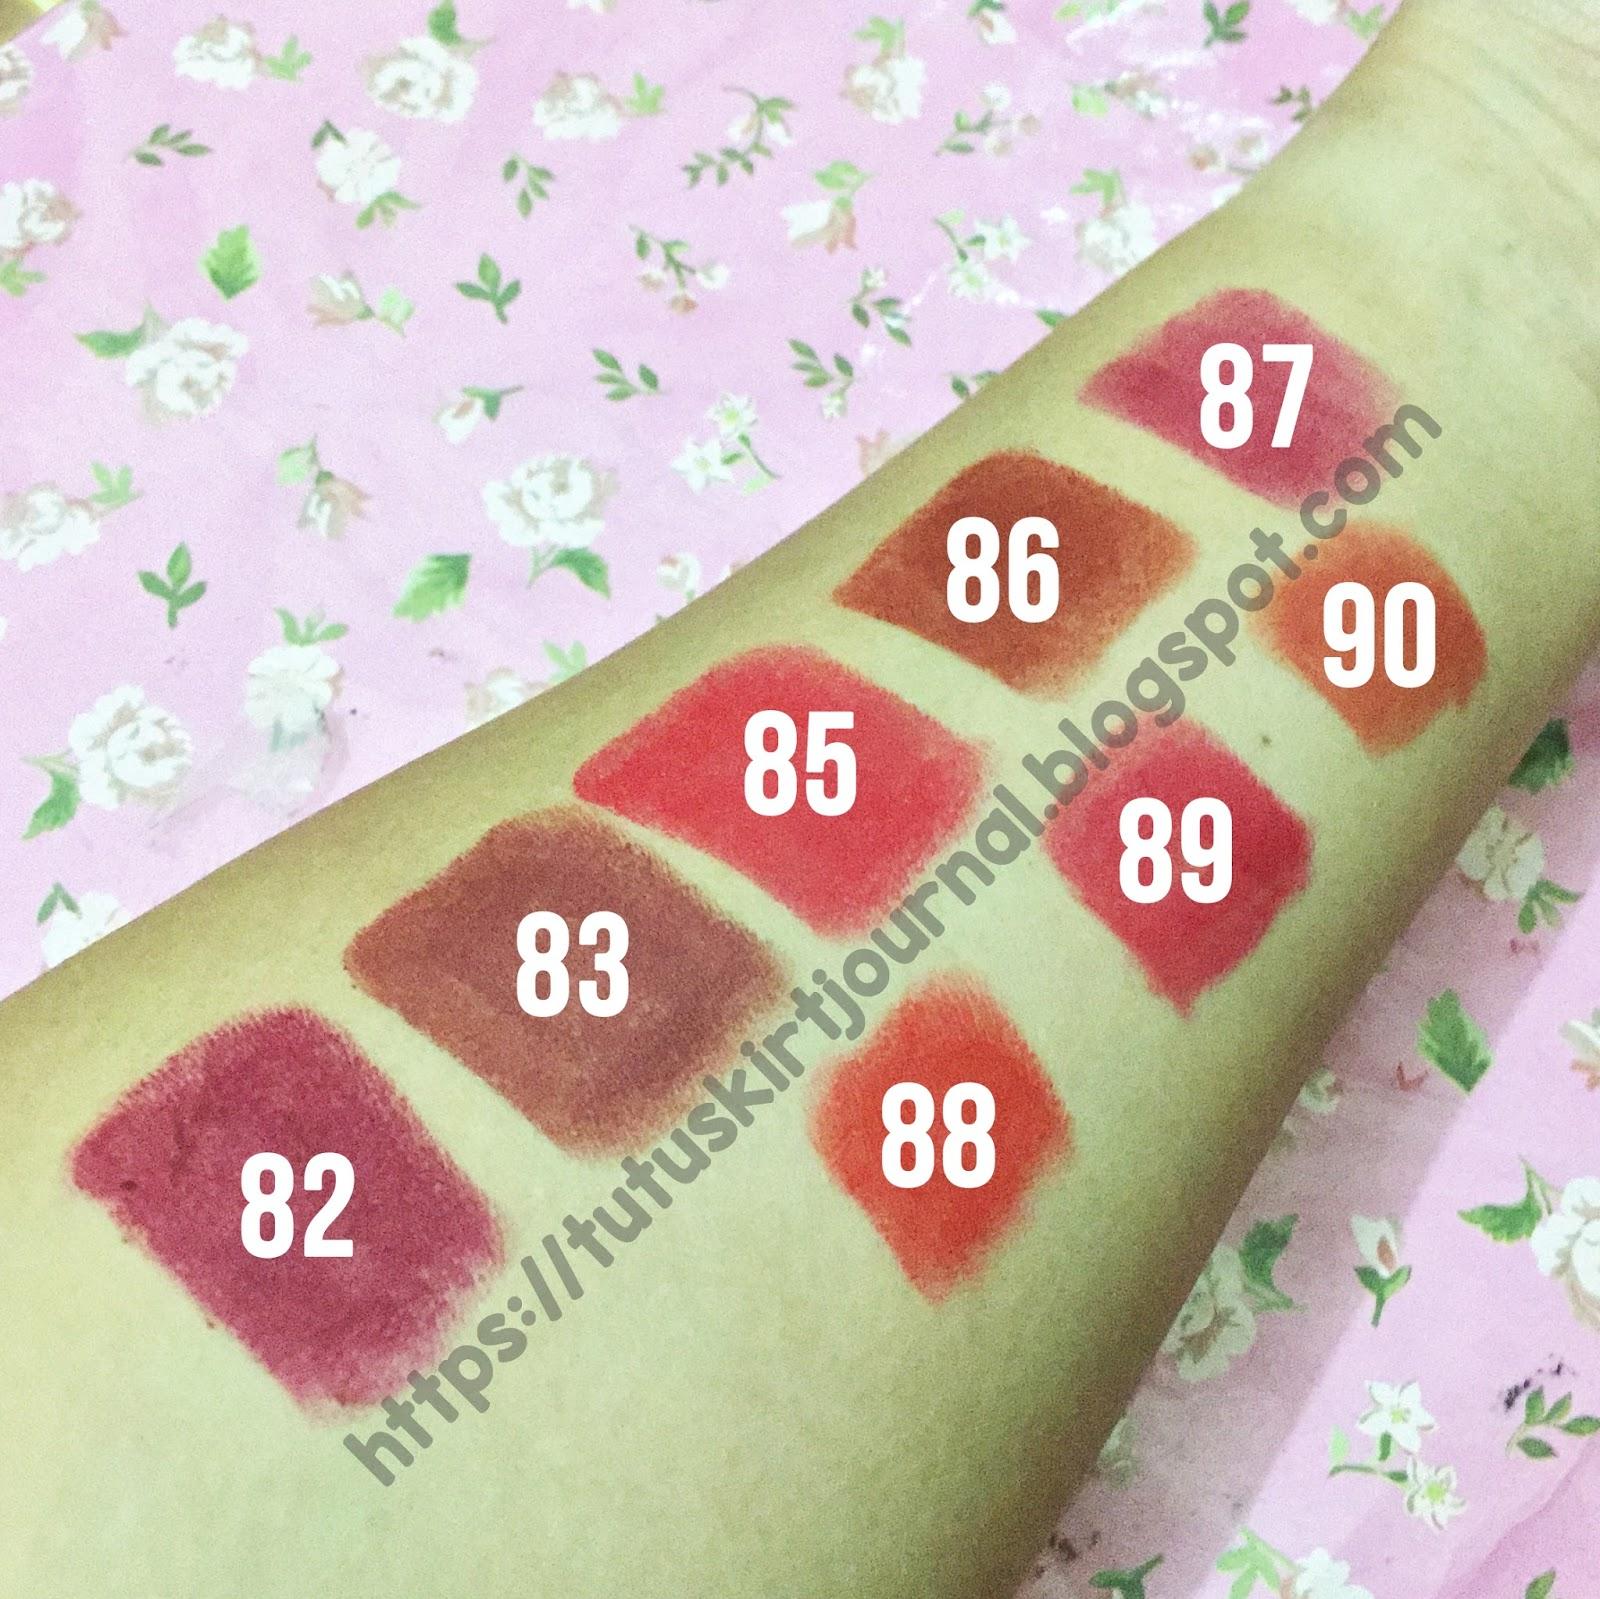 Tutuskirtjournal Review Purbasari Lipstick Color Matte Lipstik Collor Swatch 8 Shade Tanpa Flash